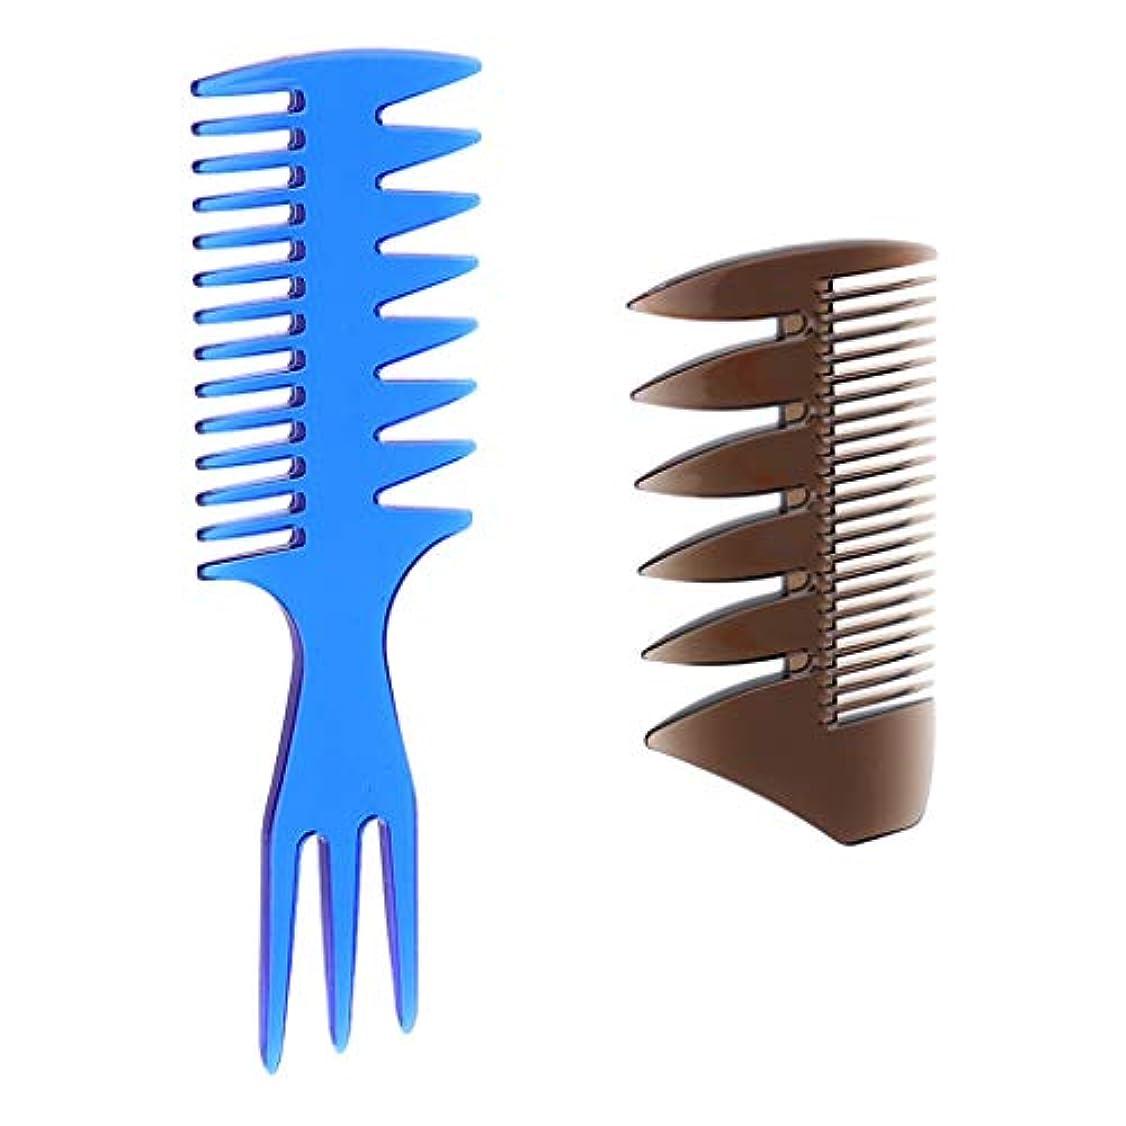 gazechimp 3-in-1櫛 2-in-1櫛 ヘアサロン 髪の櫛 静電気防止櫛 2個